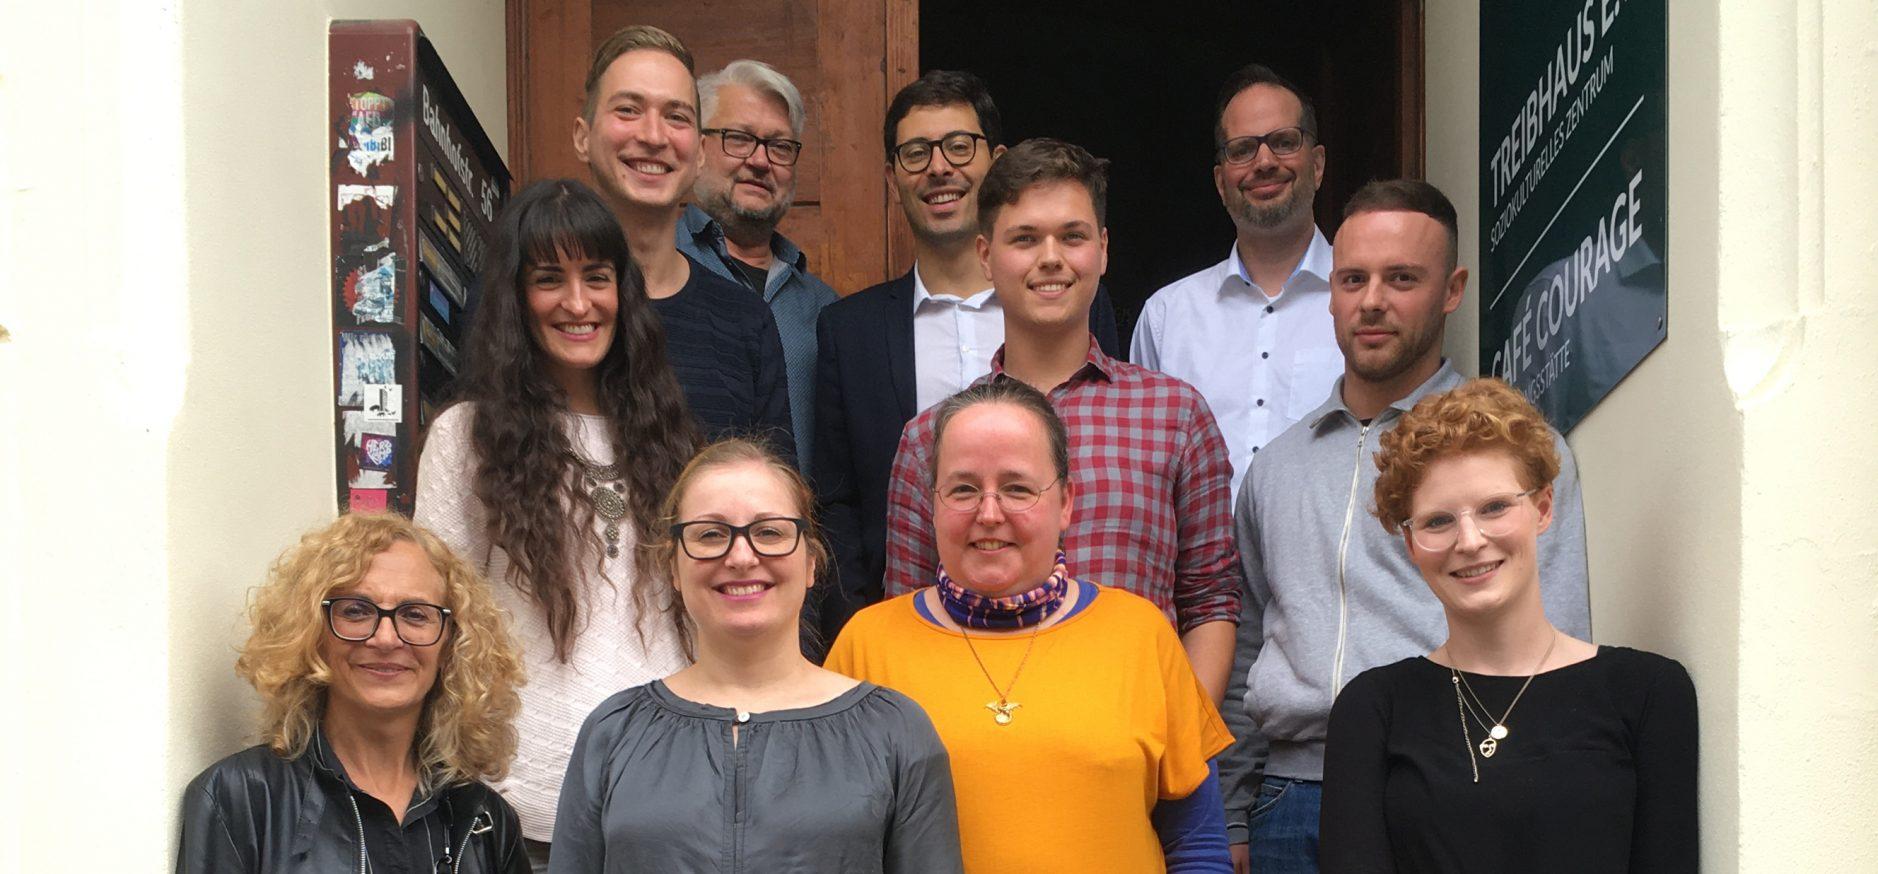 Internationale Netzwerke – Arrival Regions Treffen im Treibhaus e.V.